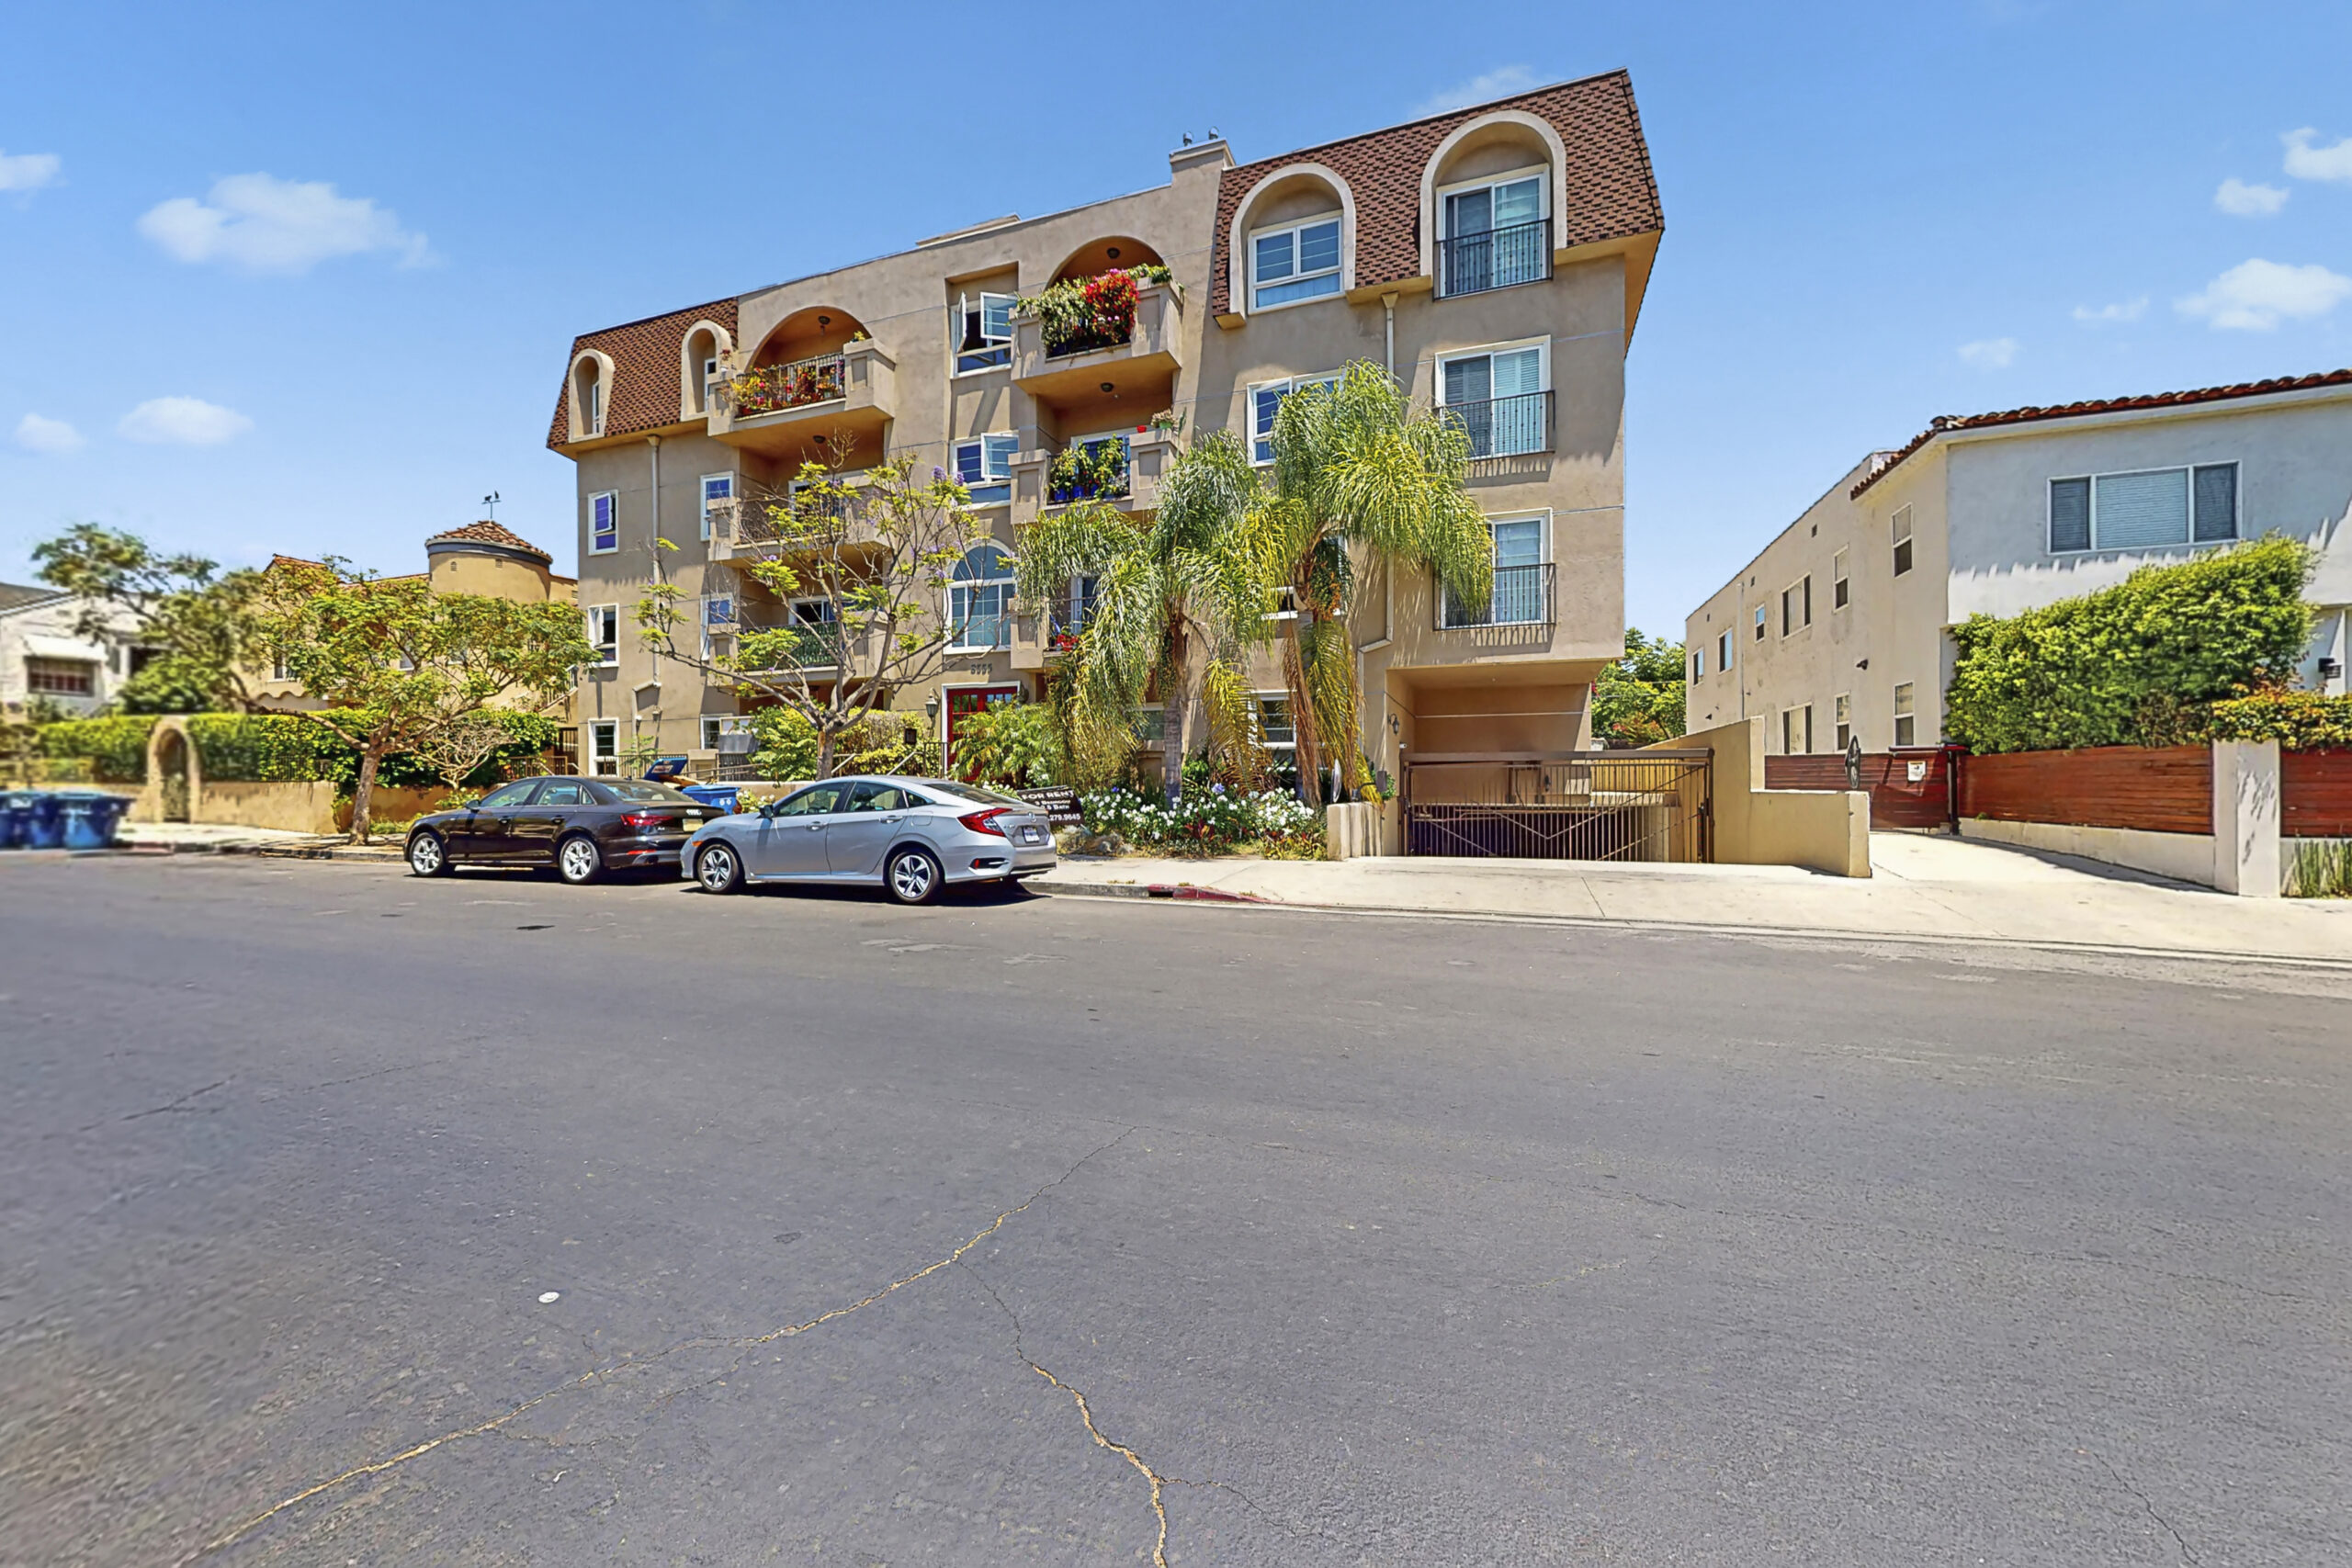 8555 Cashio St., #202, Los Angeles, CA